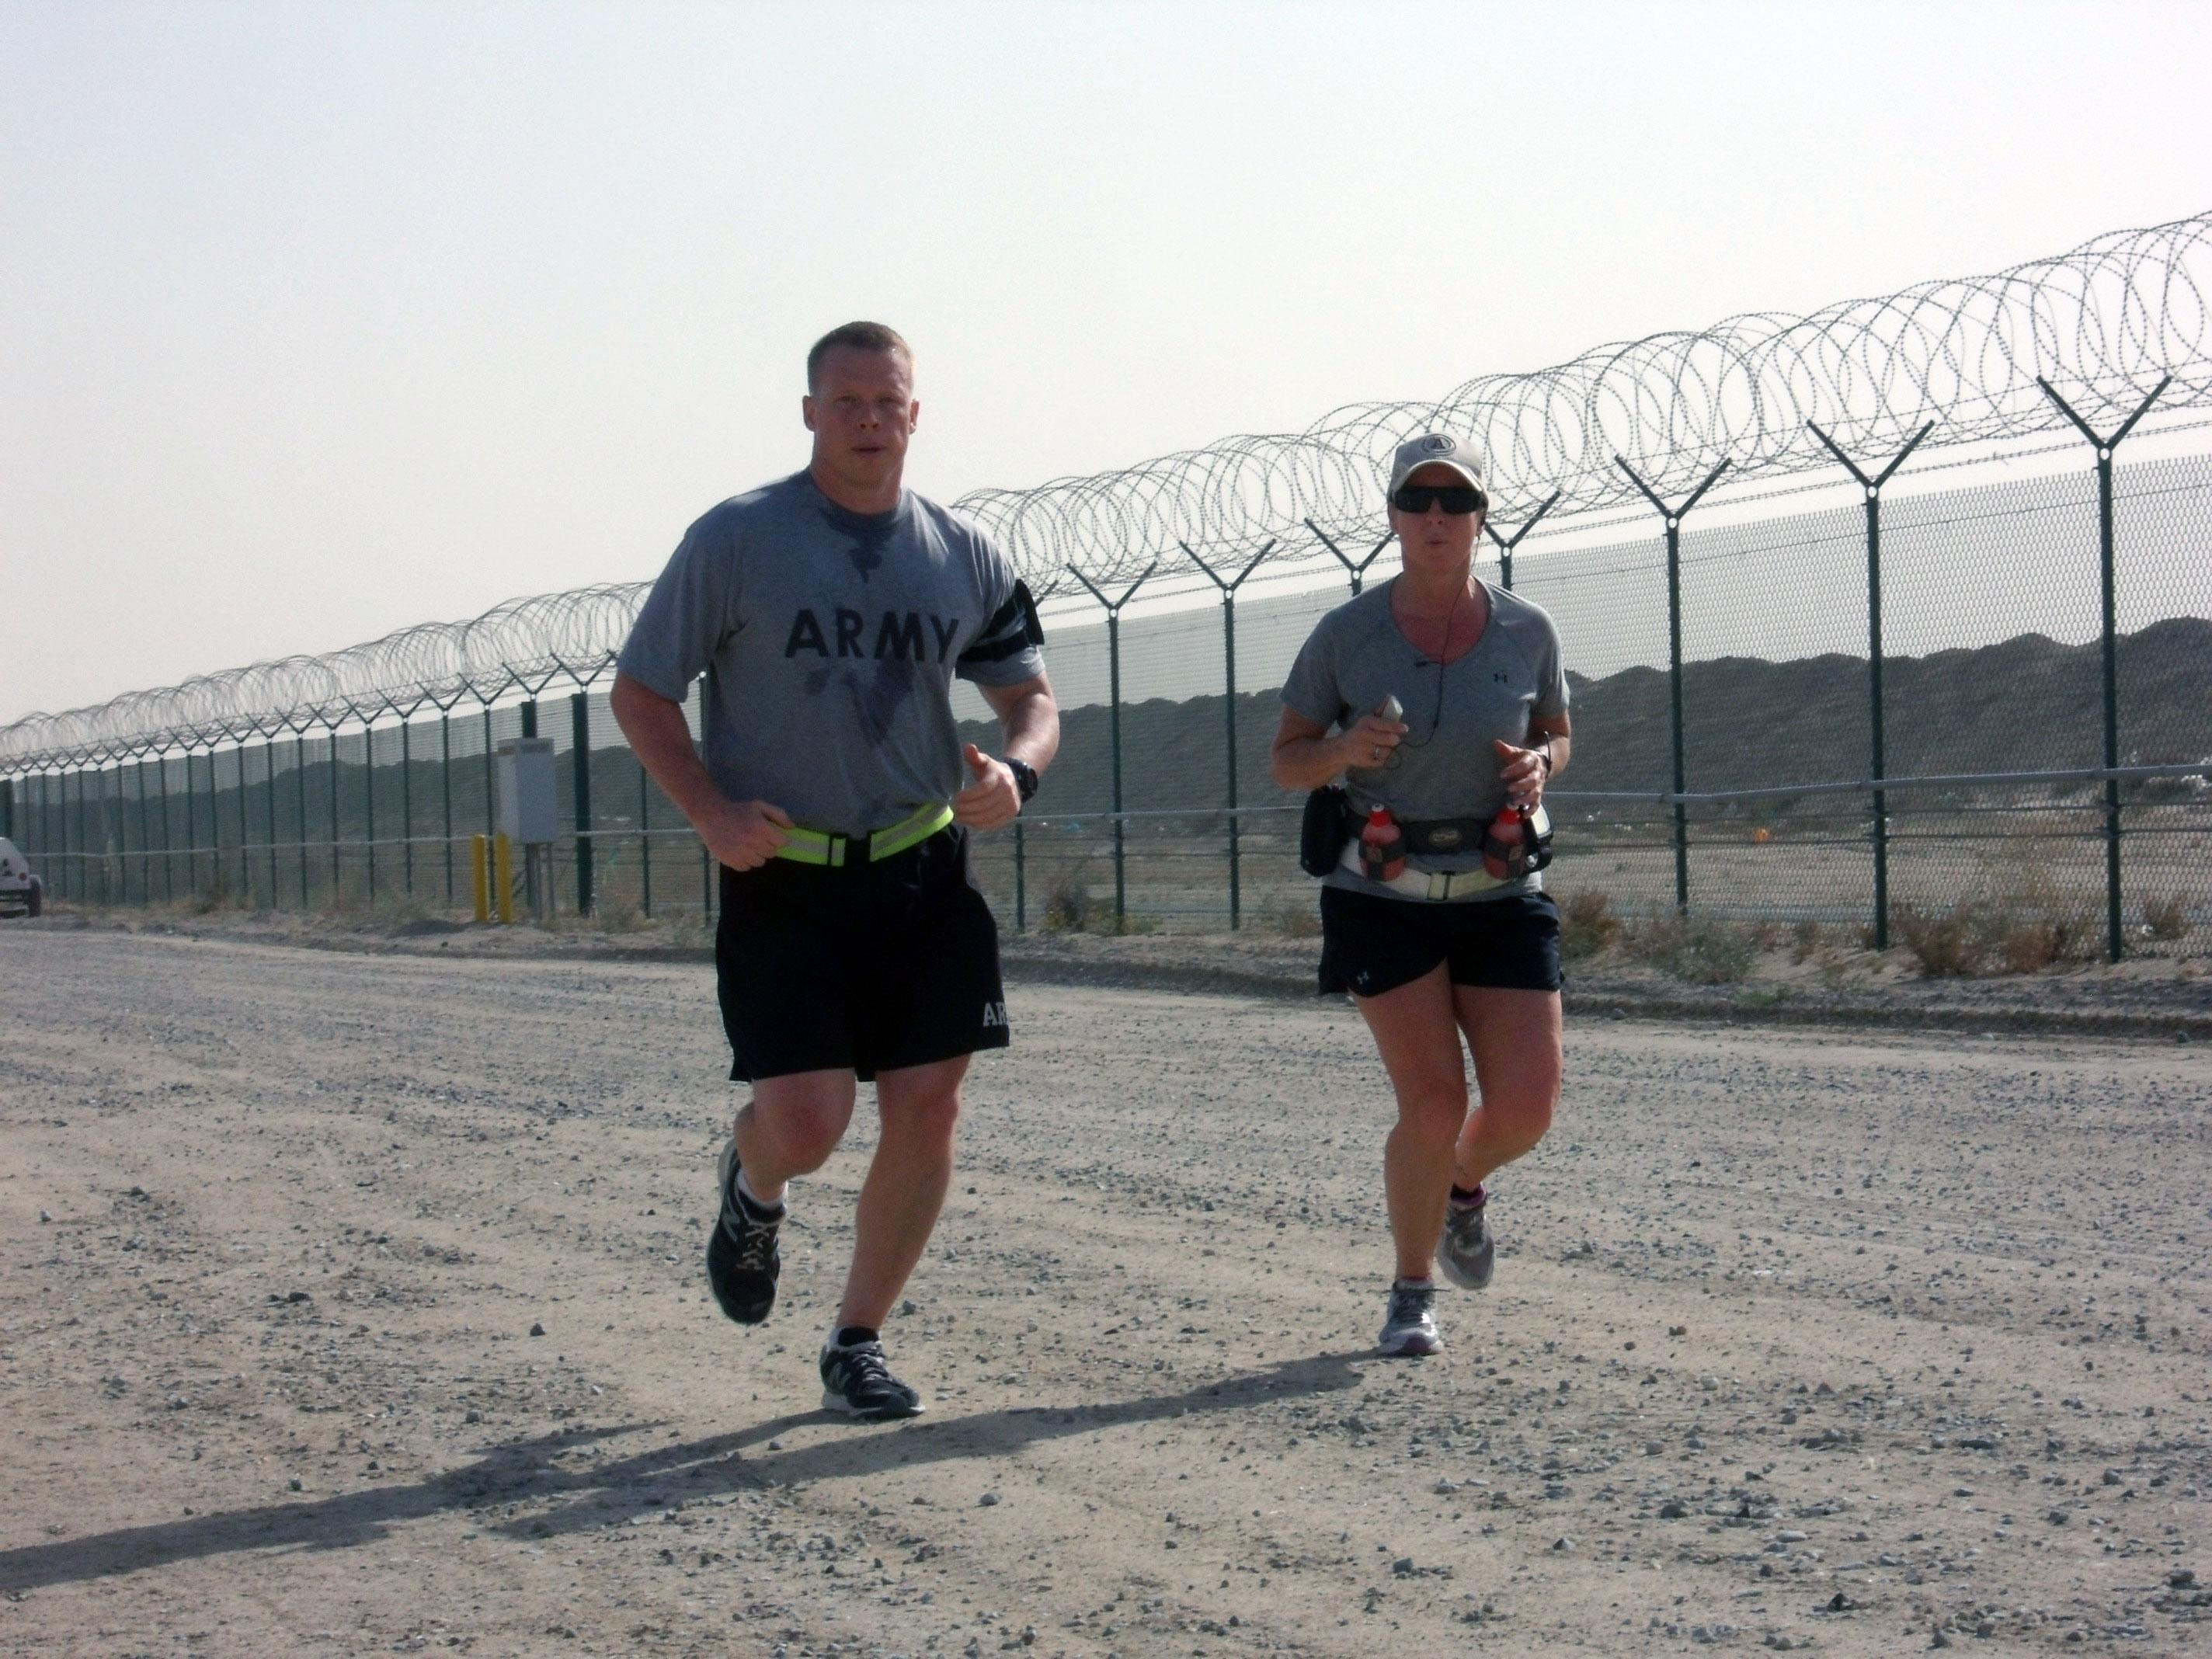 North Carolina Guard member dedicates 100-mile run to fallen comrades